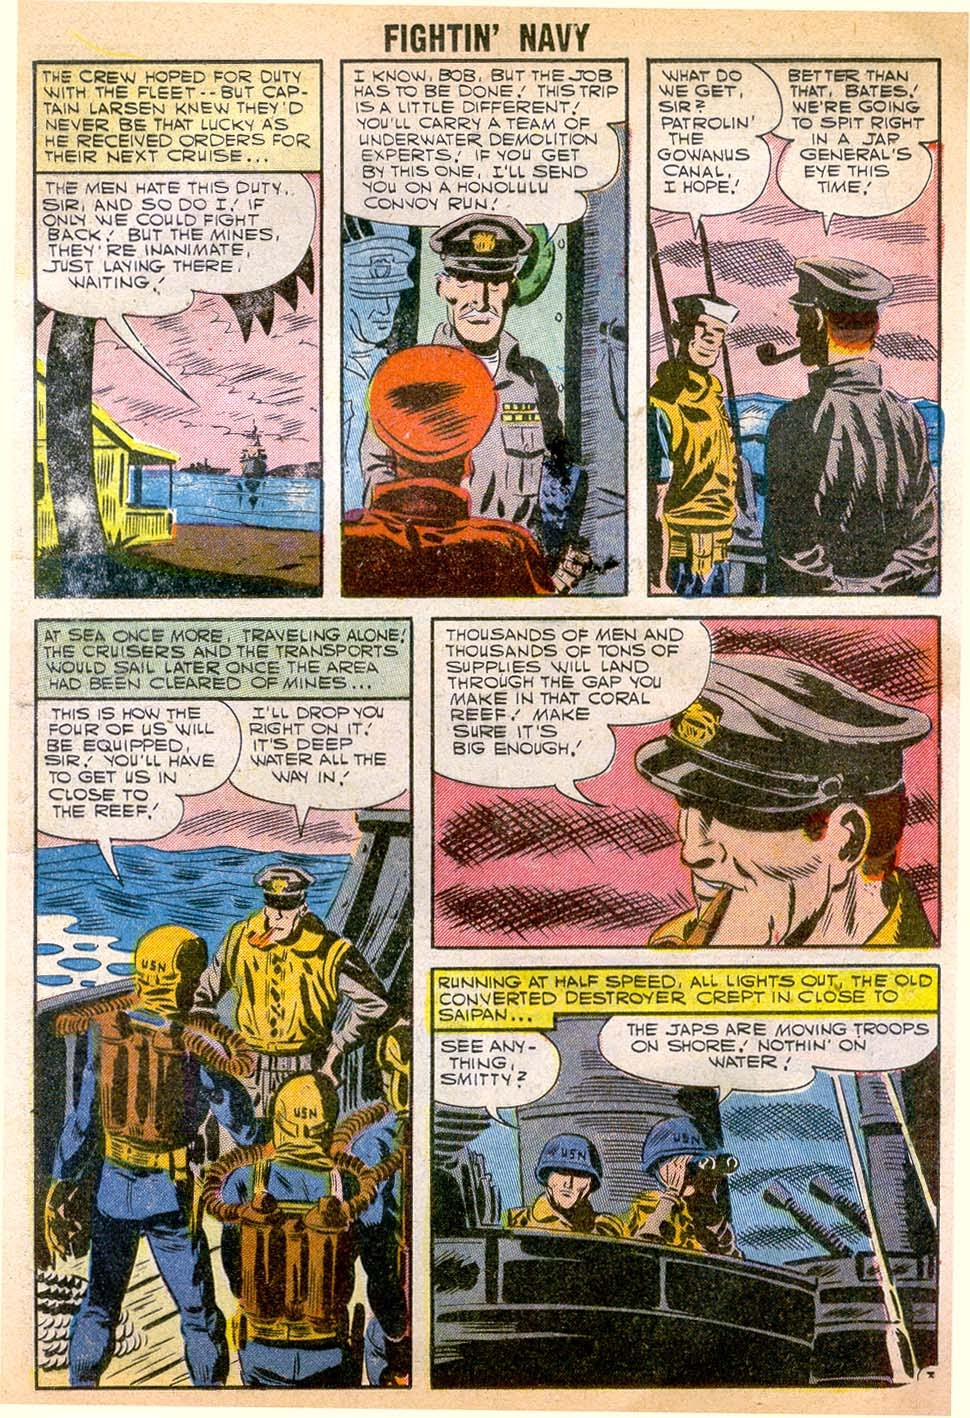 Read online Fightin' Navy comic -  Issue #79 - 13